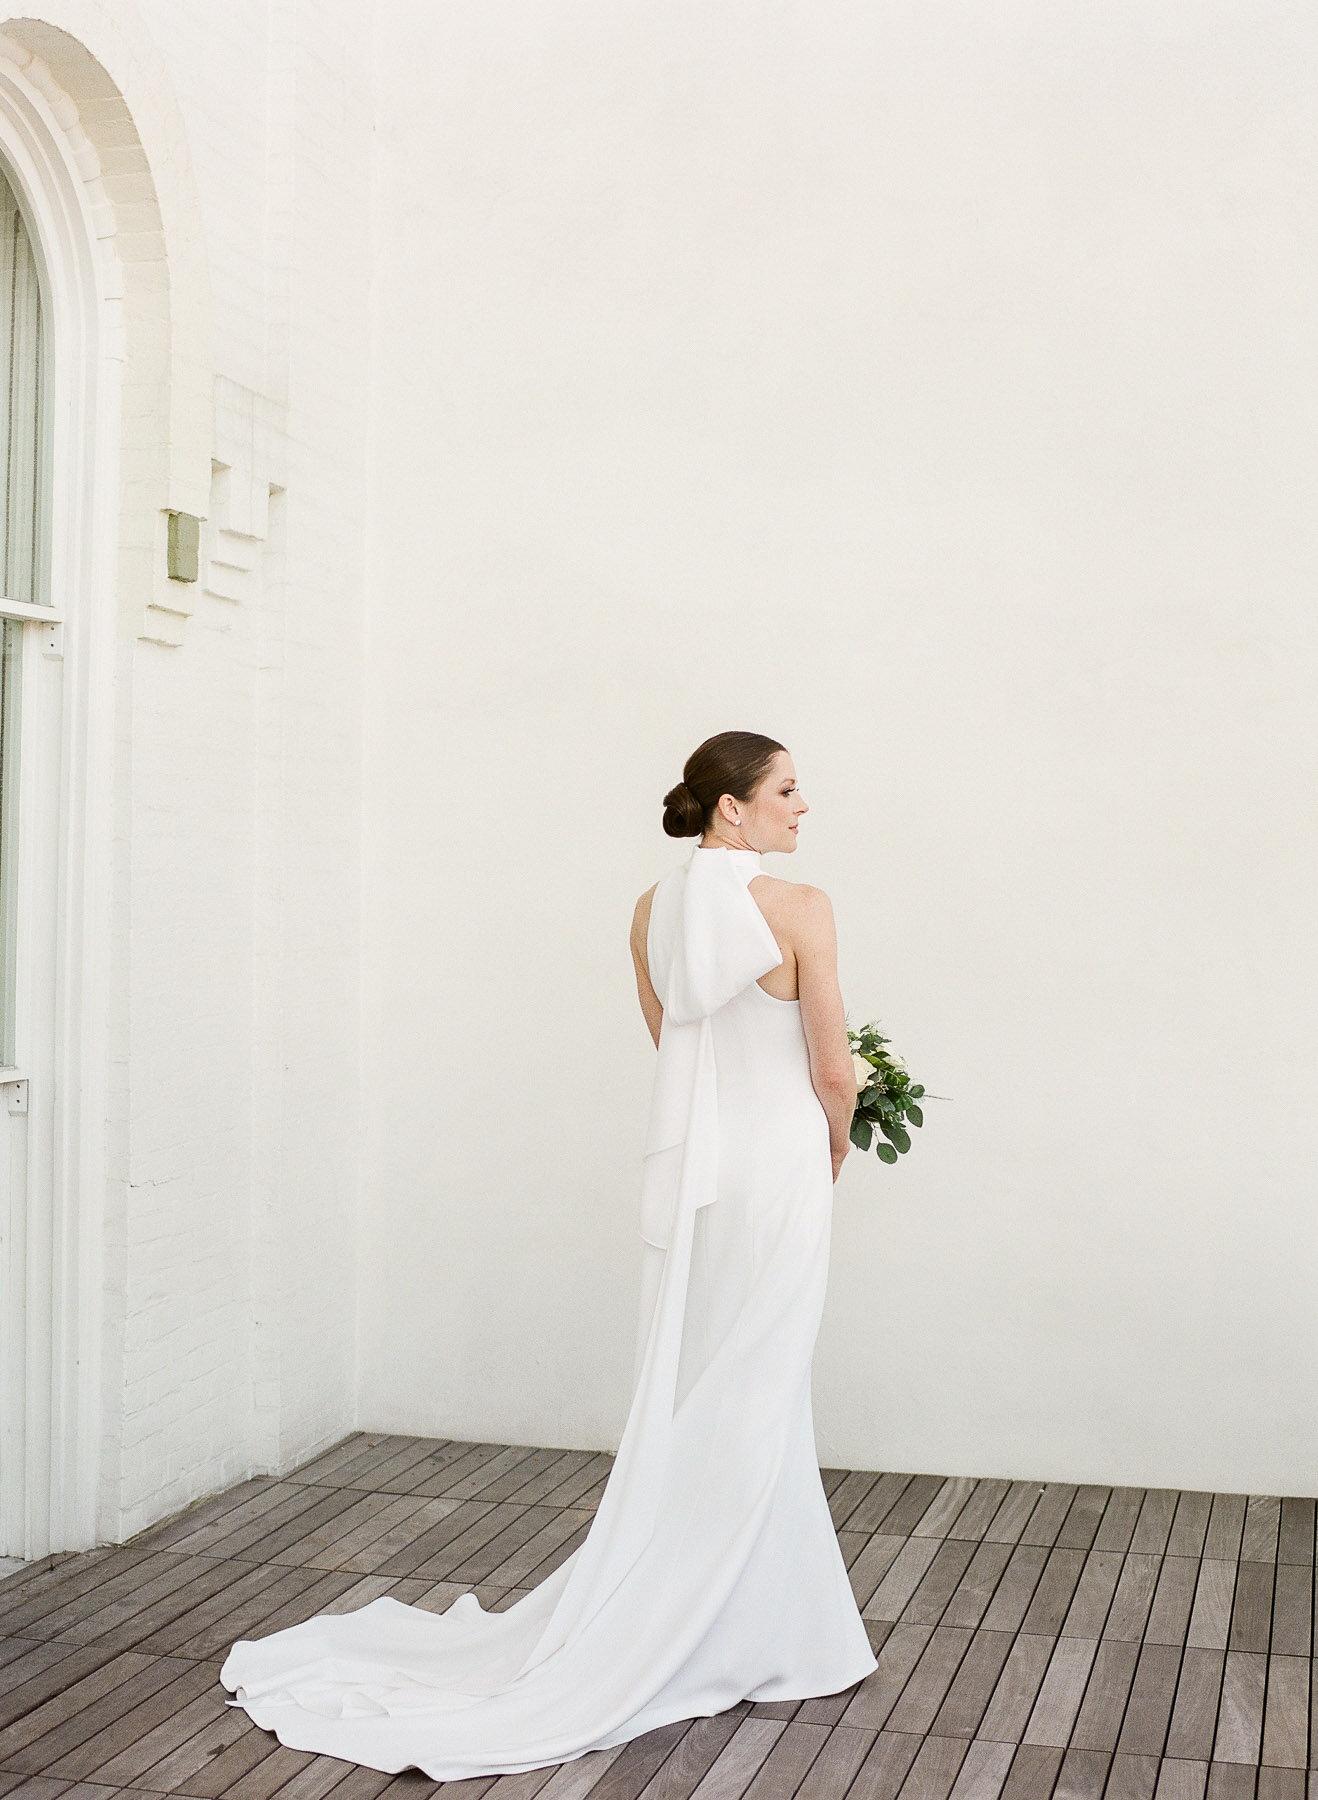 Adelphi Saratoga Wedding by Michelle Lange Photography-16.jpg